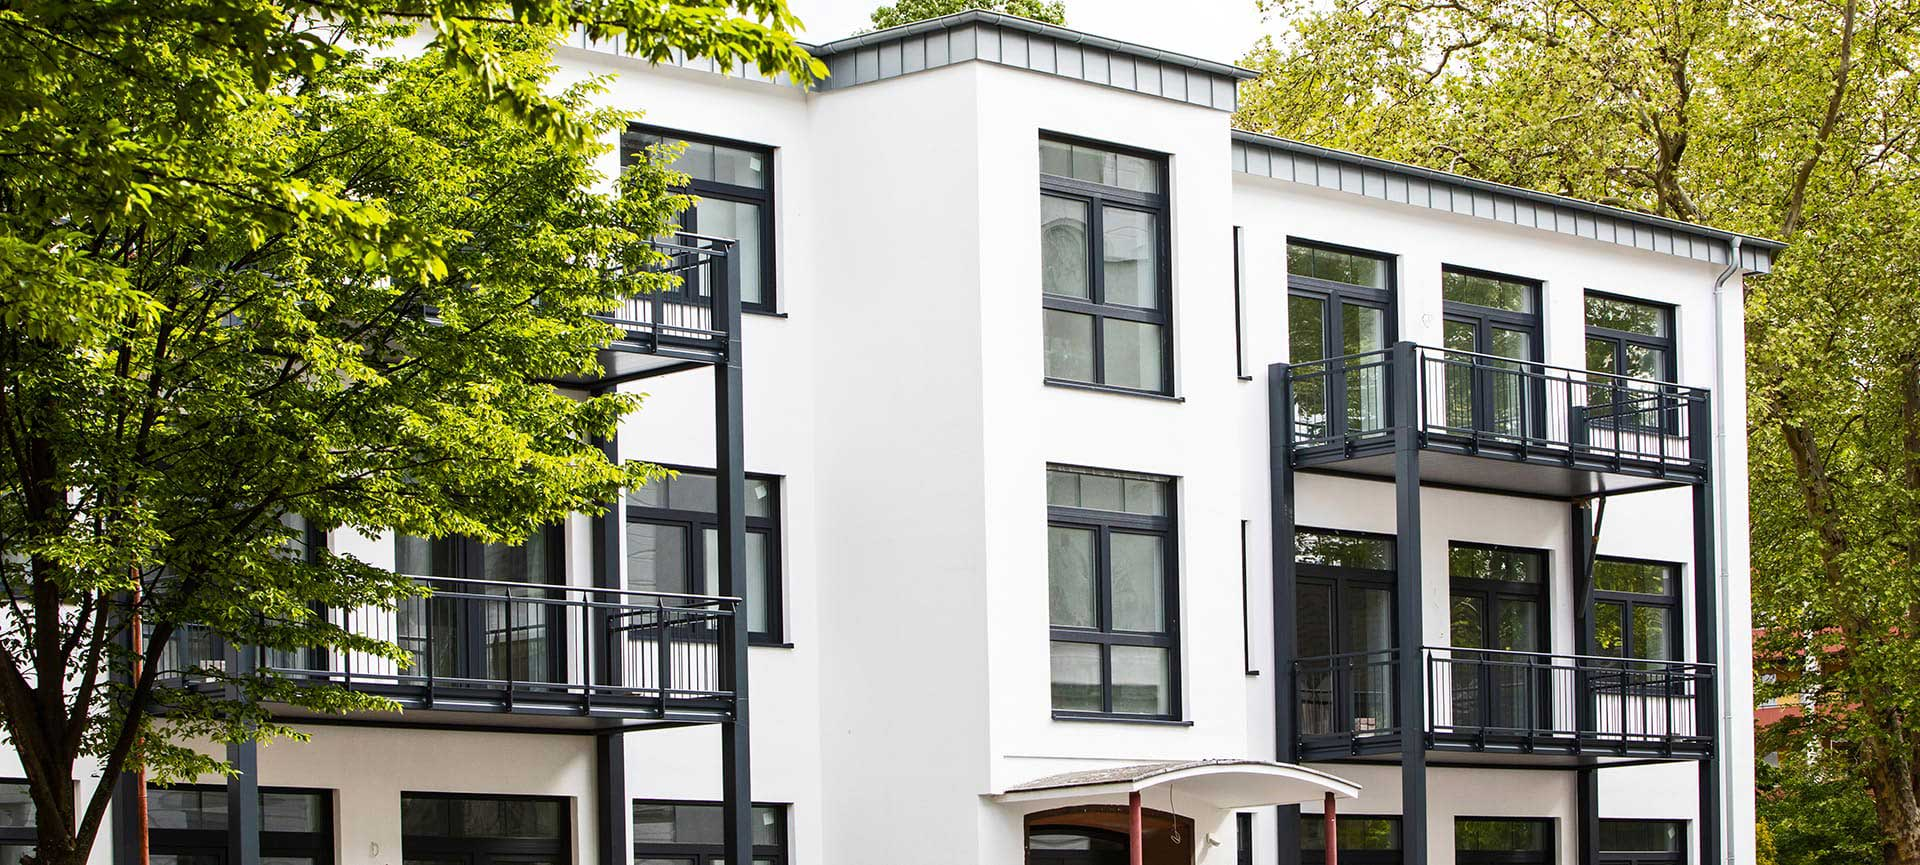 modernes weisses wohngebaeude mit schwarzen balkonen 1